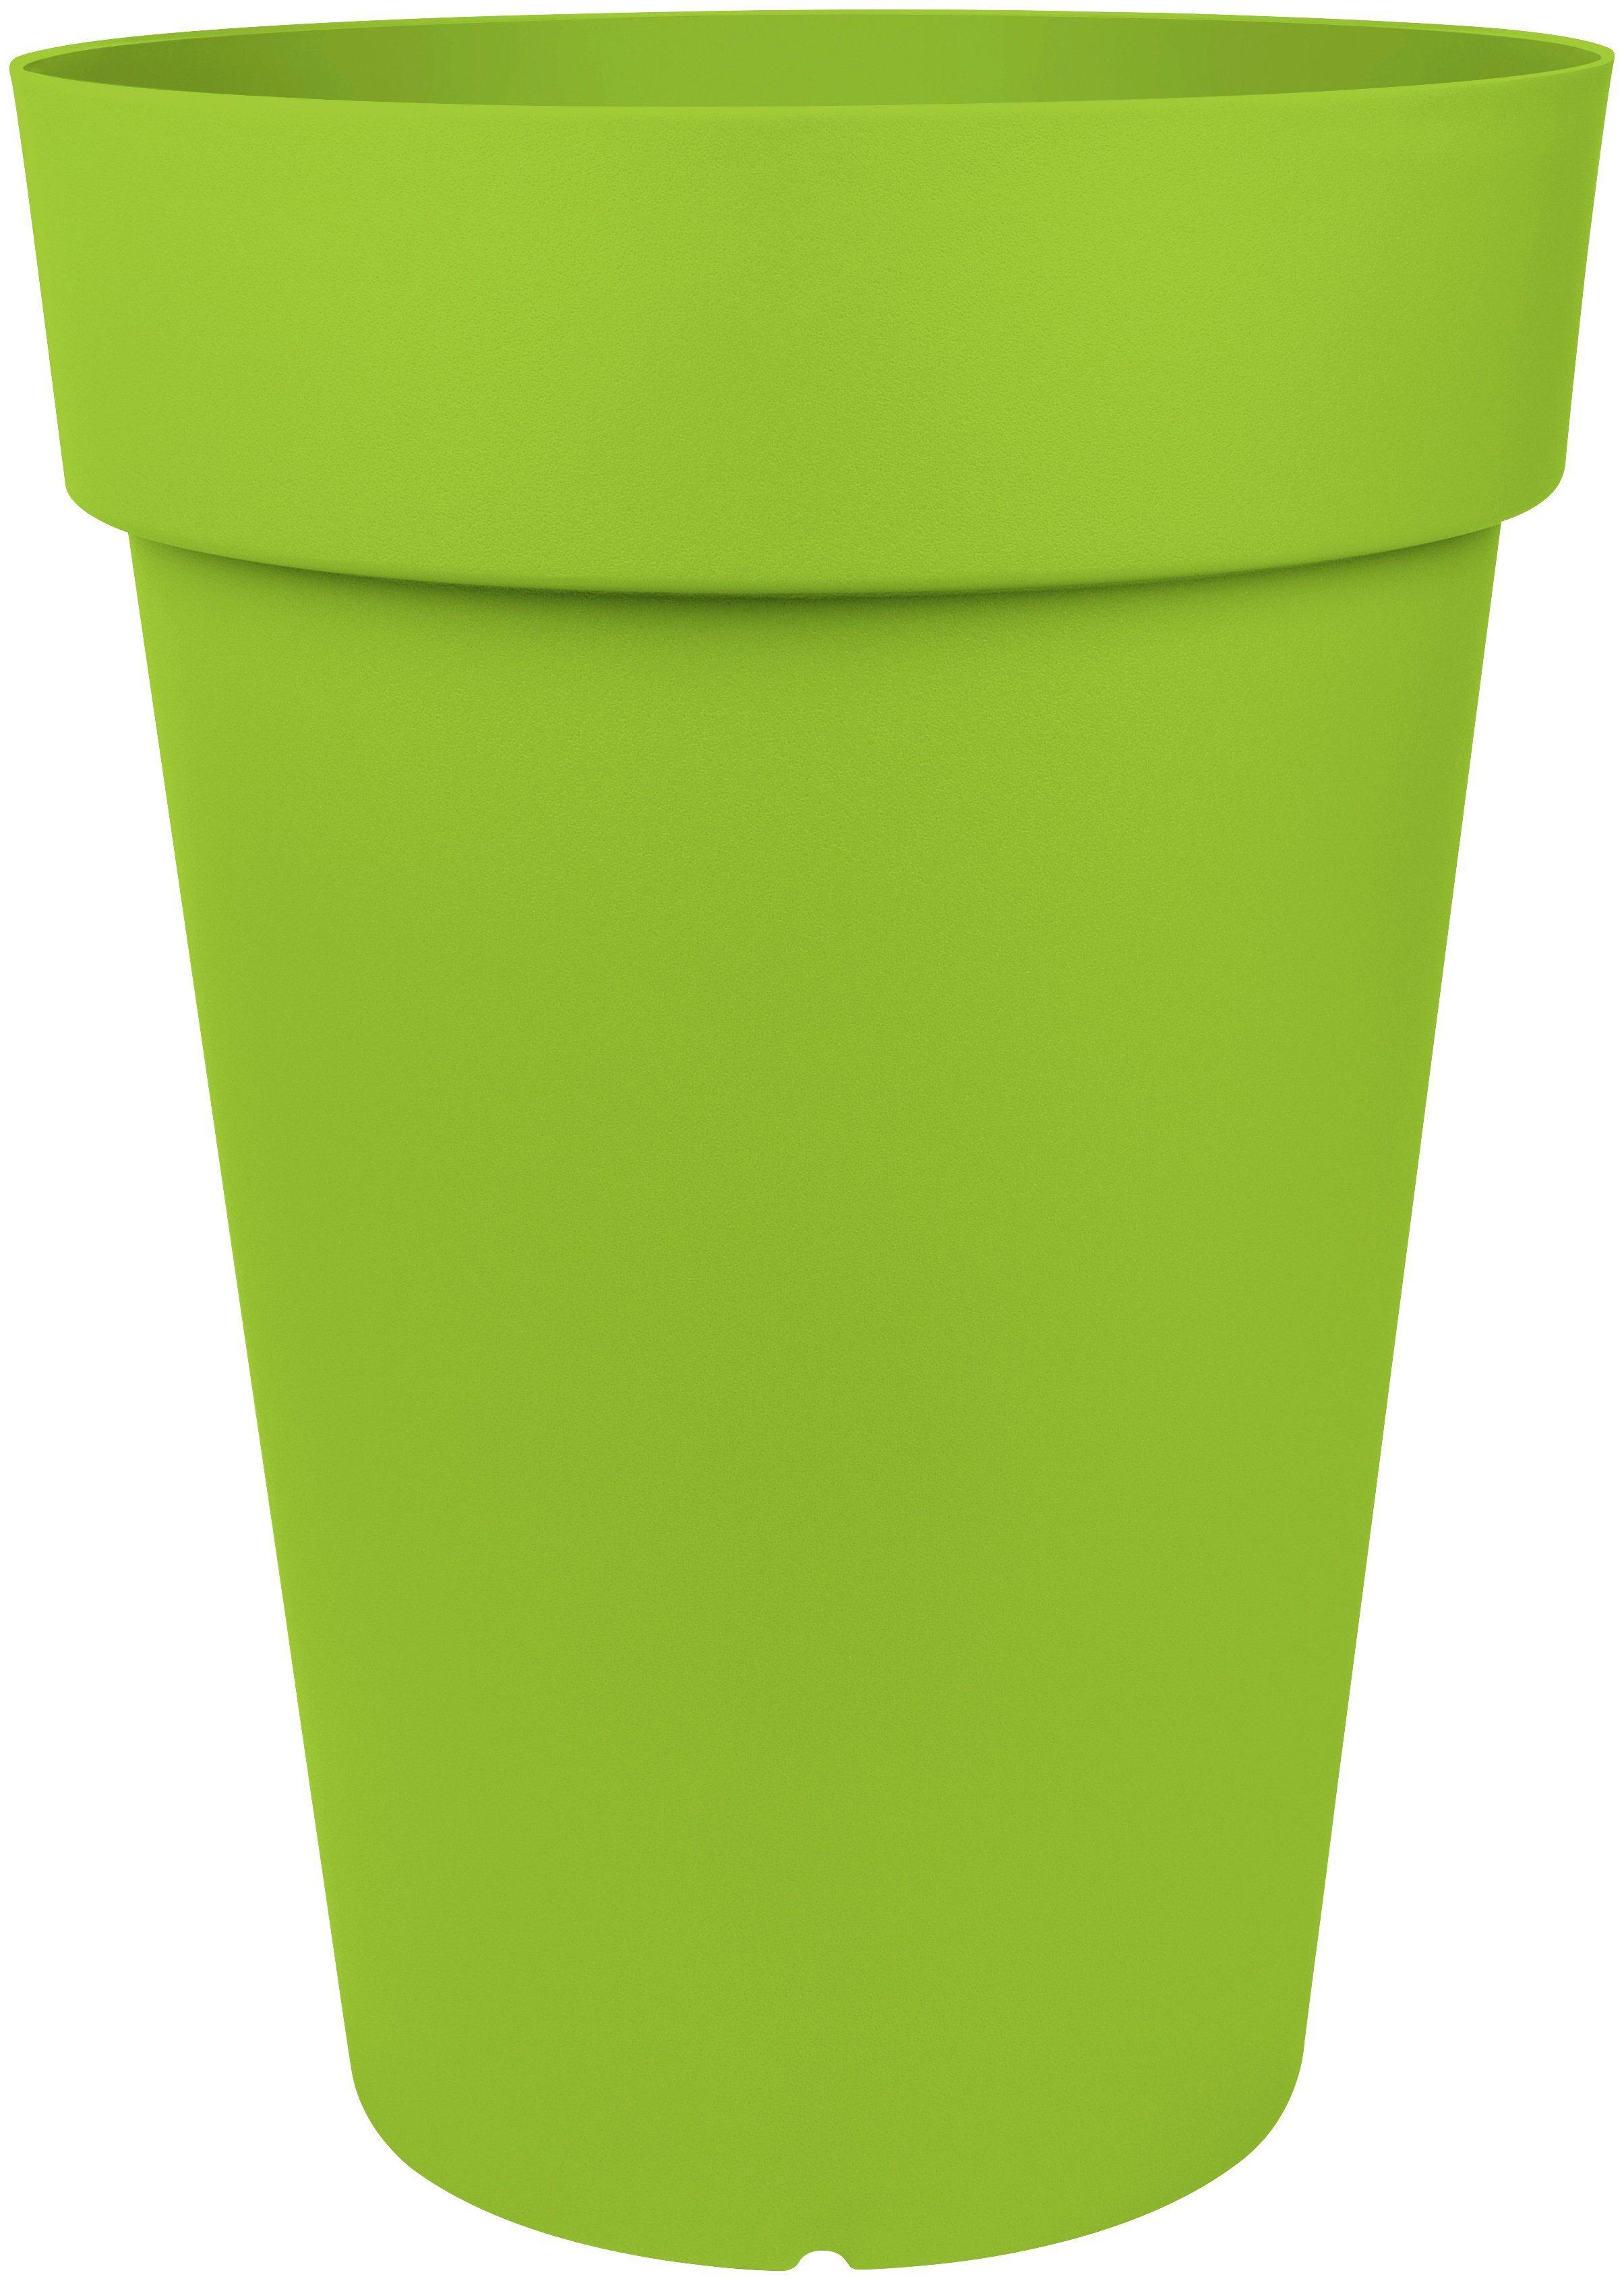 Blumenkasten »CITY CLASSIC Kübel«, Ø/H: 40/52 cm, grün